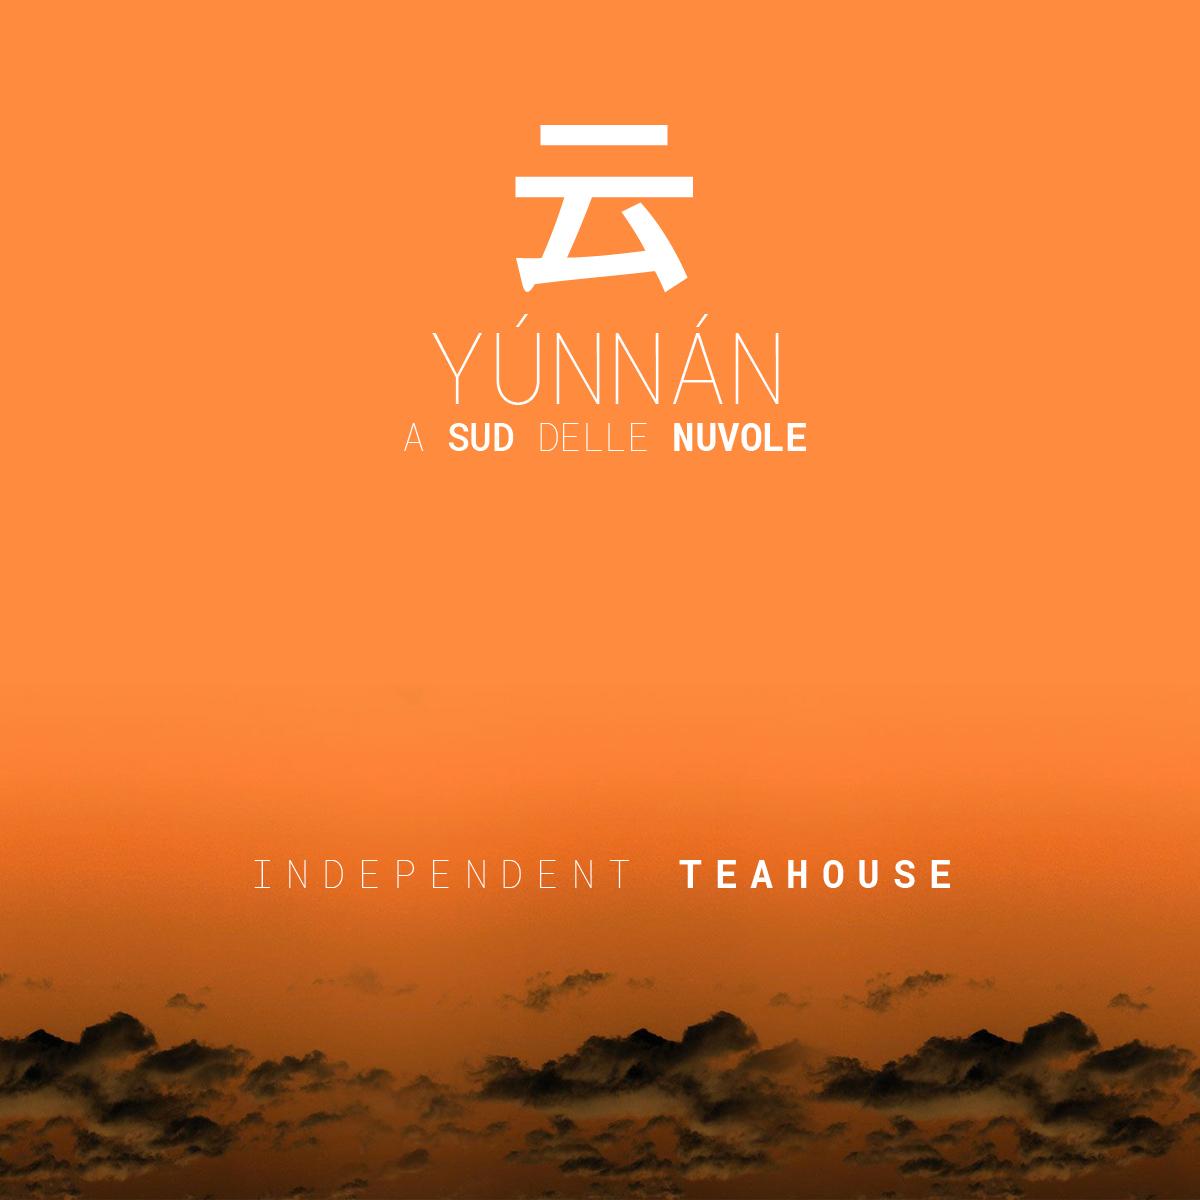 yunnan teahouse